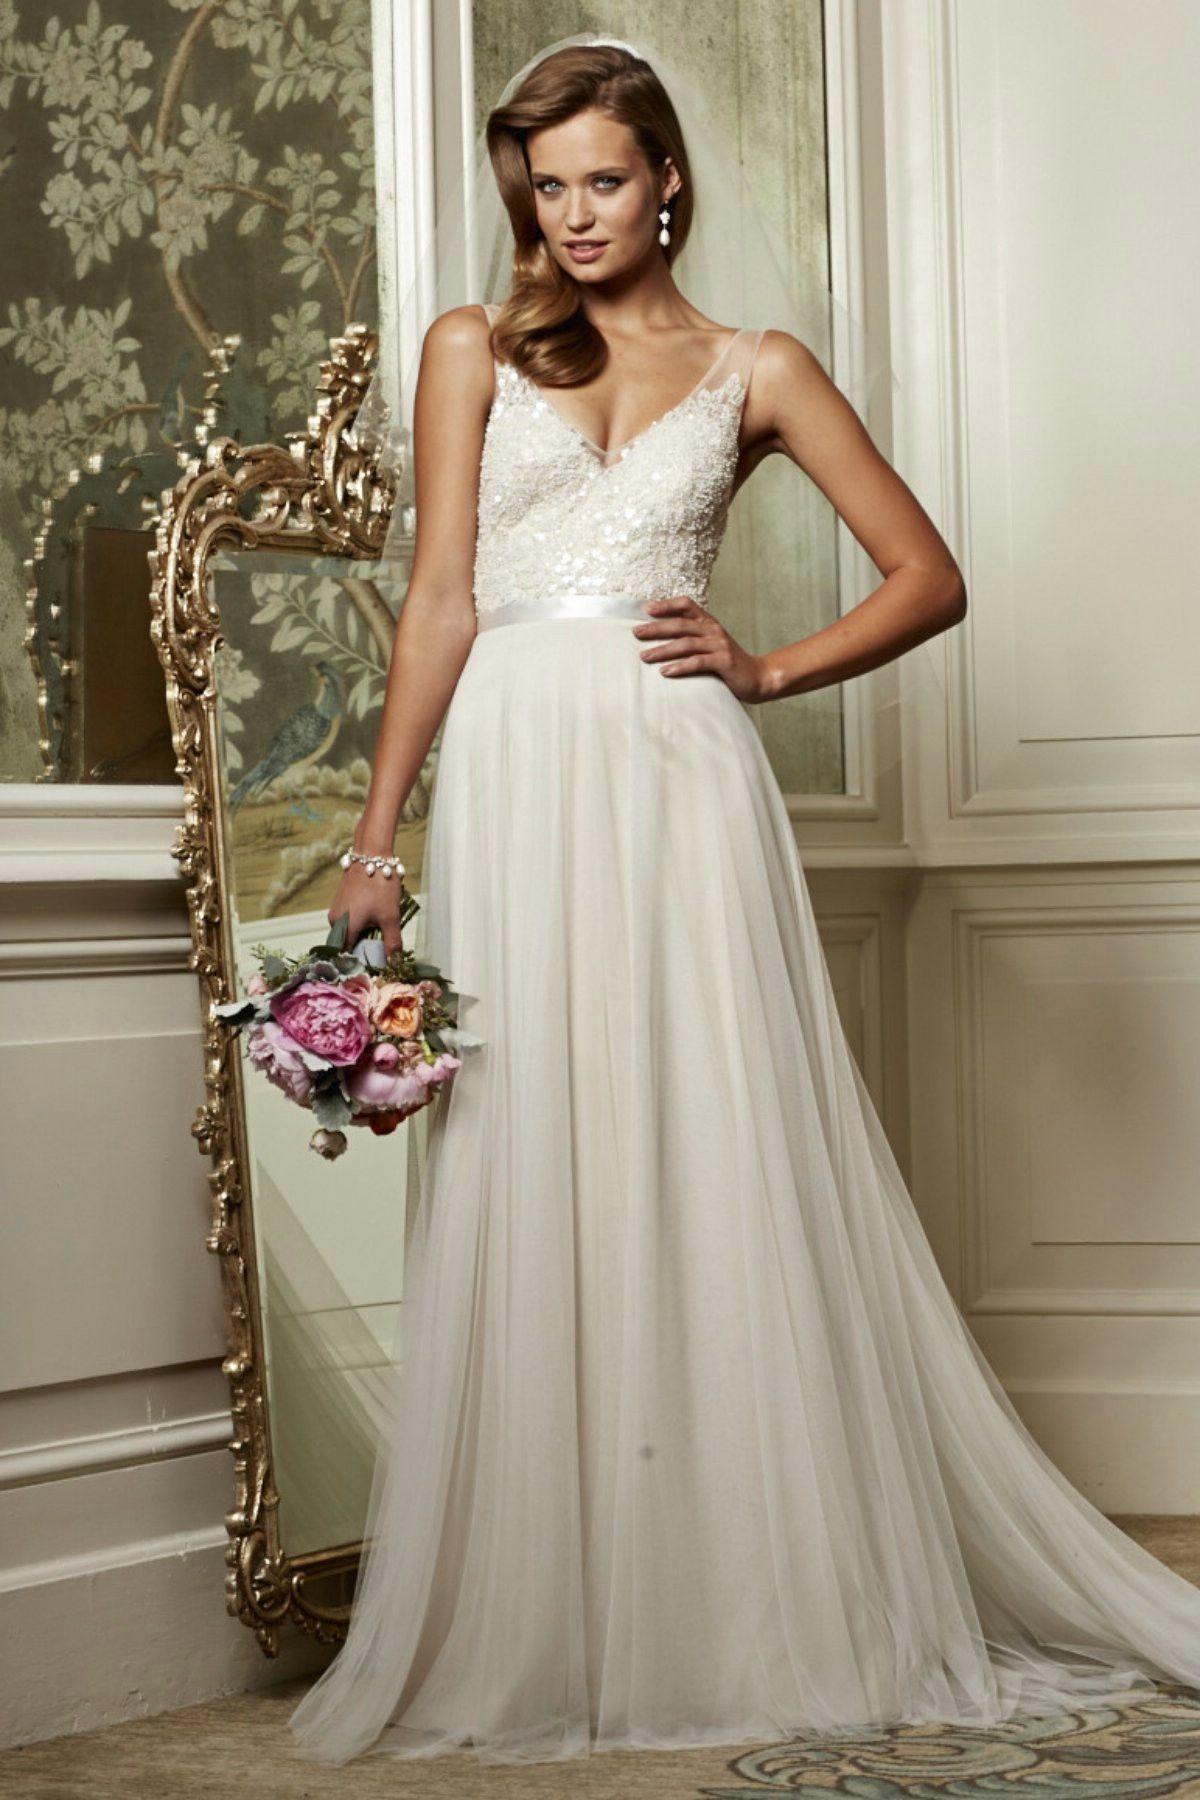 lace top sash beach wedding dress Sheer wedding dress